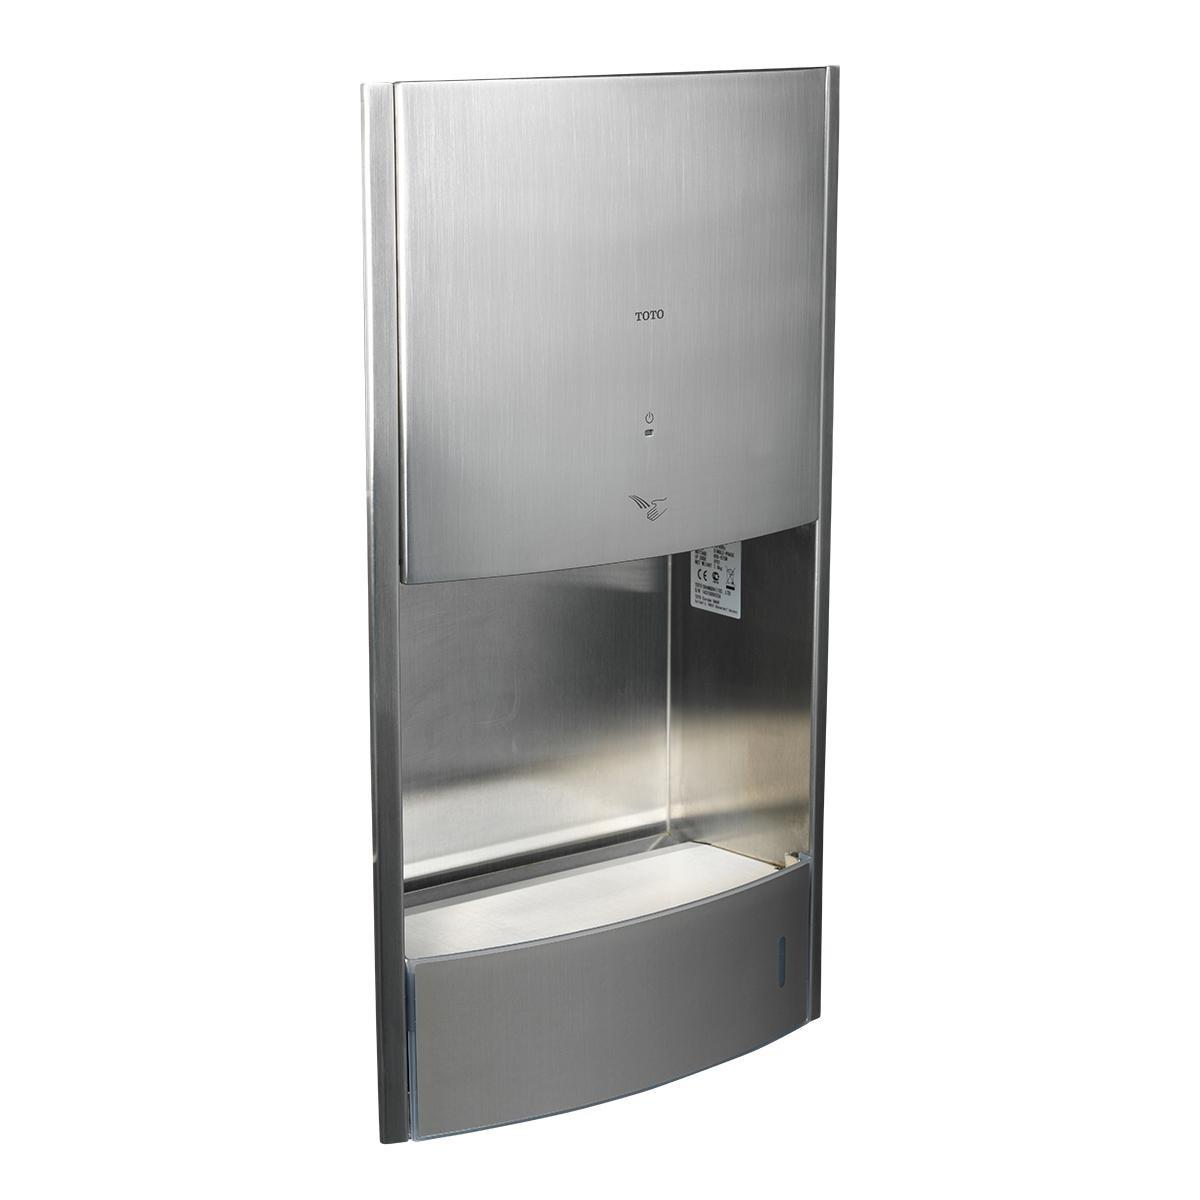 Toto Recessed Hand Dryer Tyc604 Tooaleta